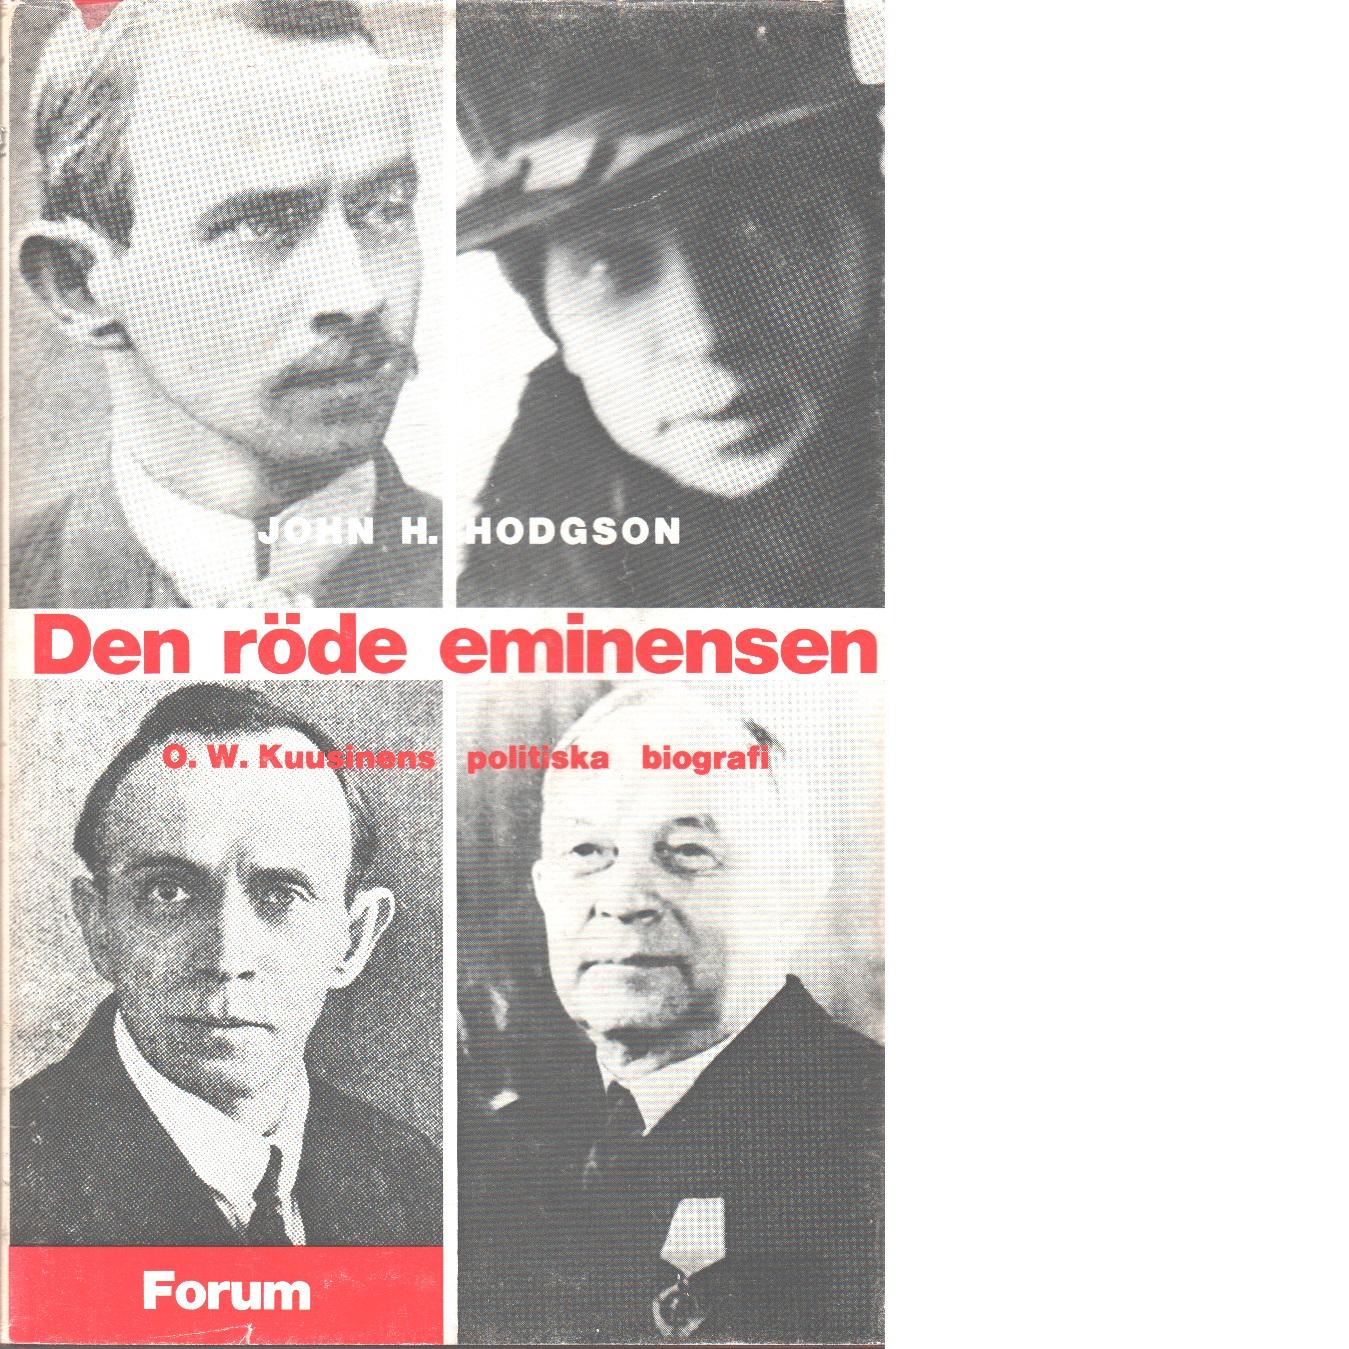 Den röde eminensen : O.W. Kuusinens politiska biografi - Hodgson, John H.